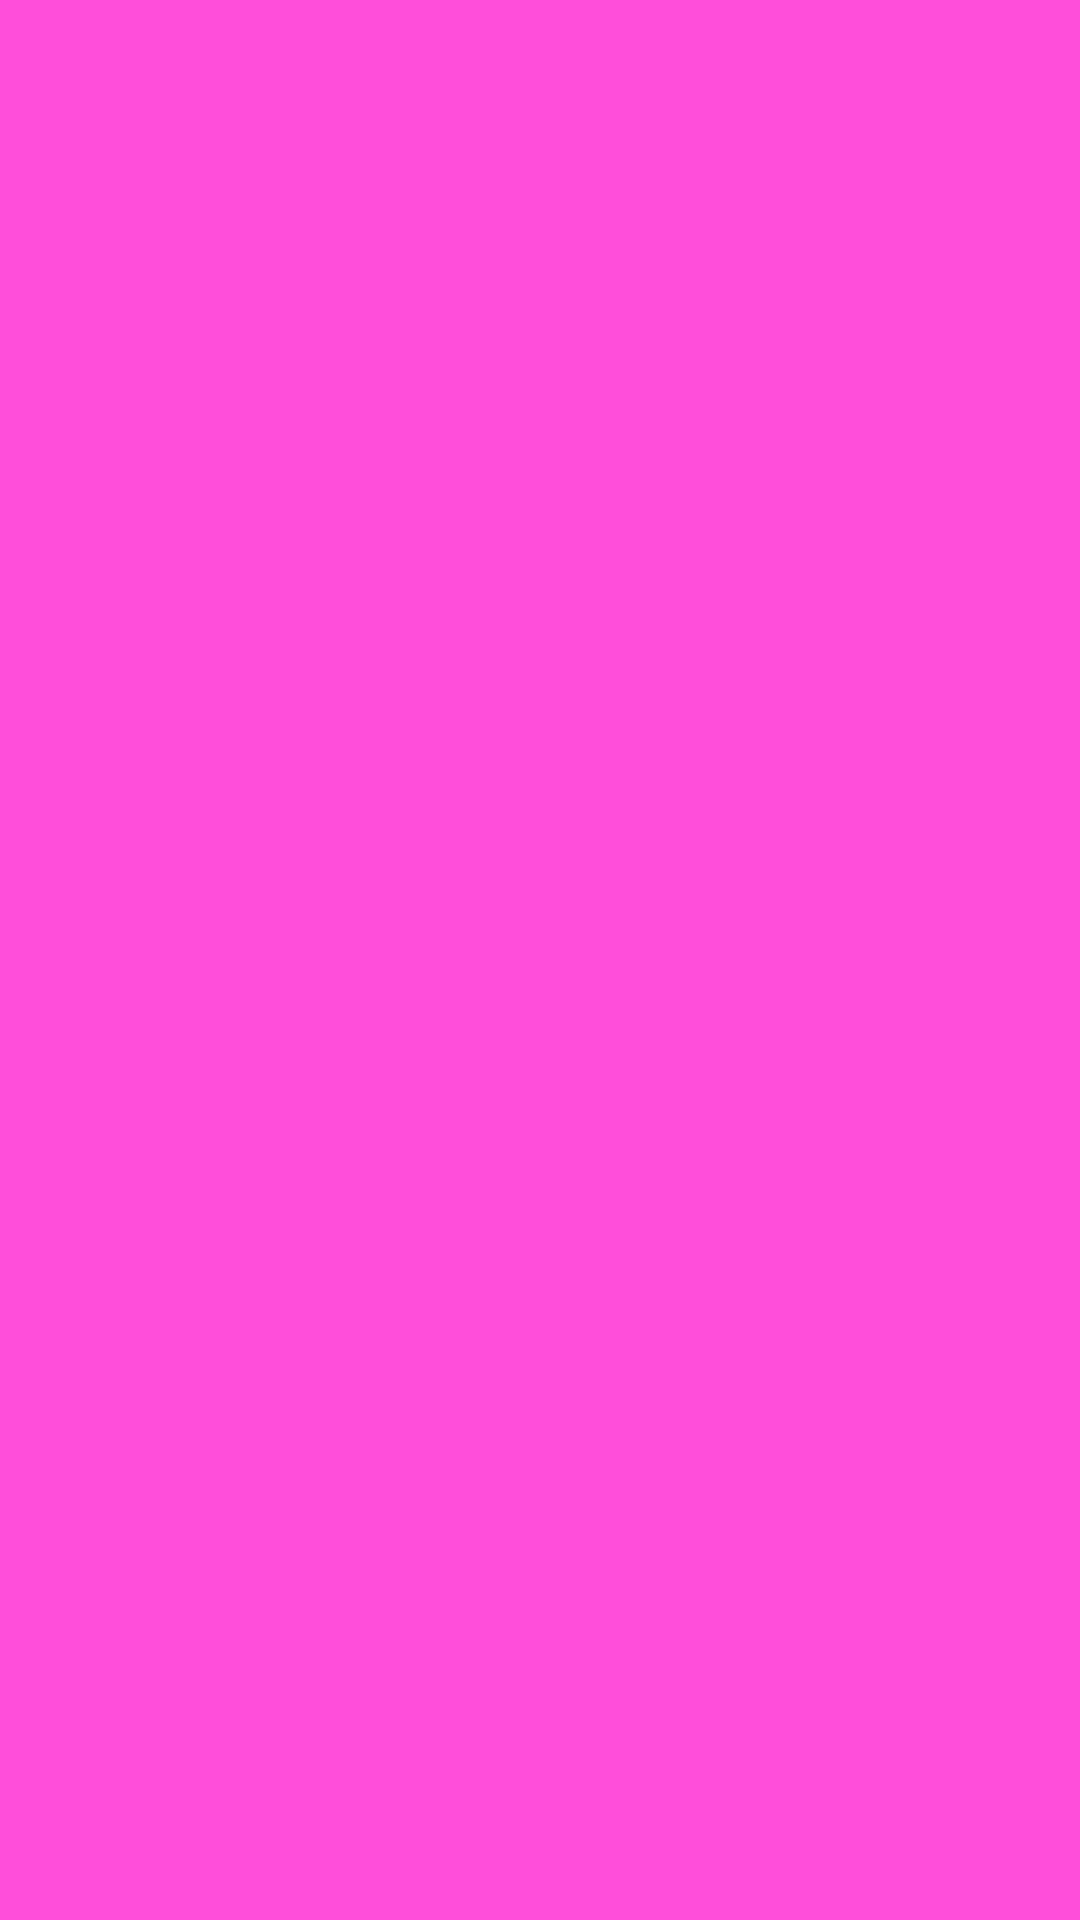 1080x1920 Purple Pizzazz Solid Color Background